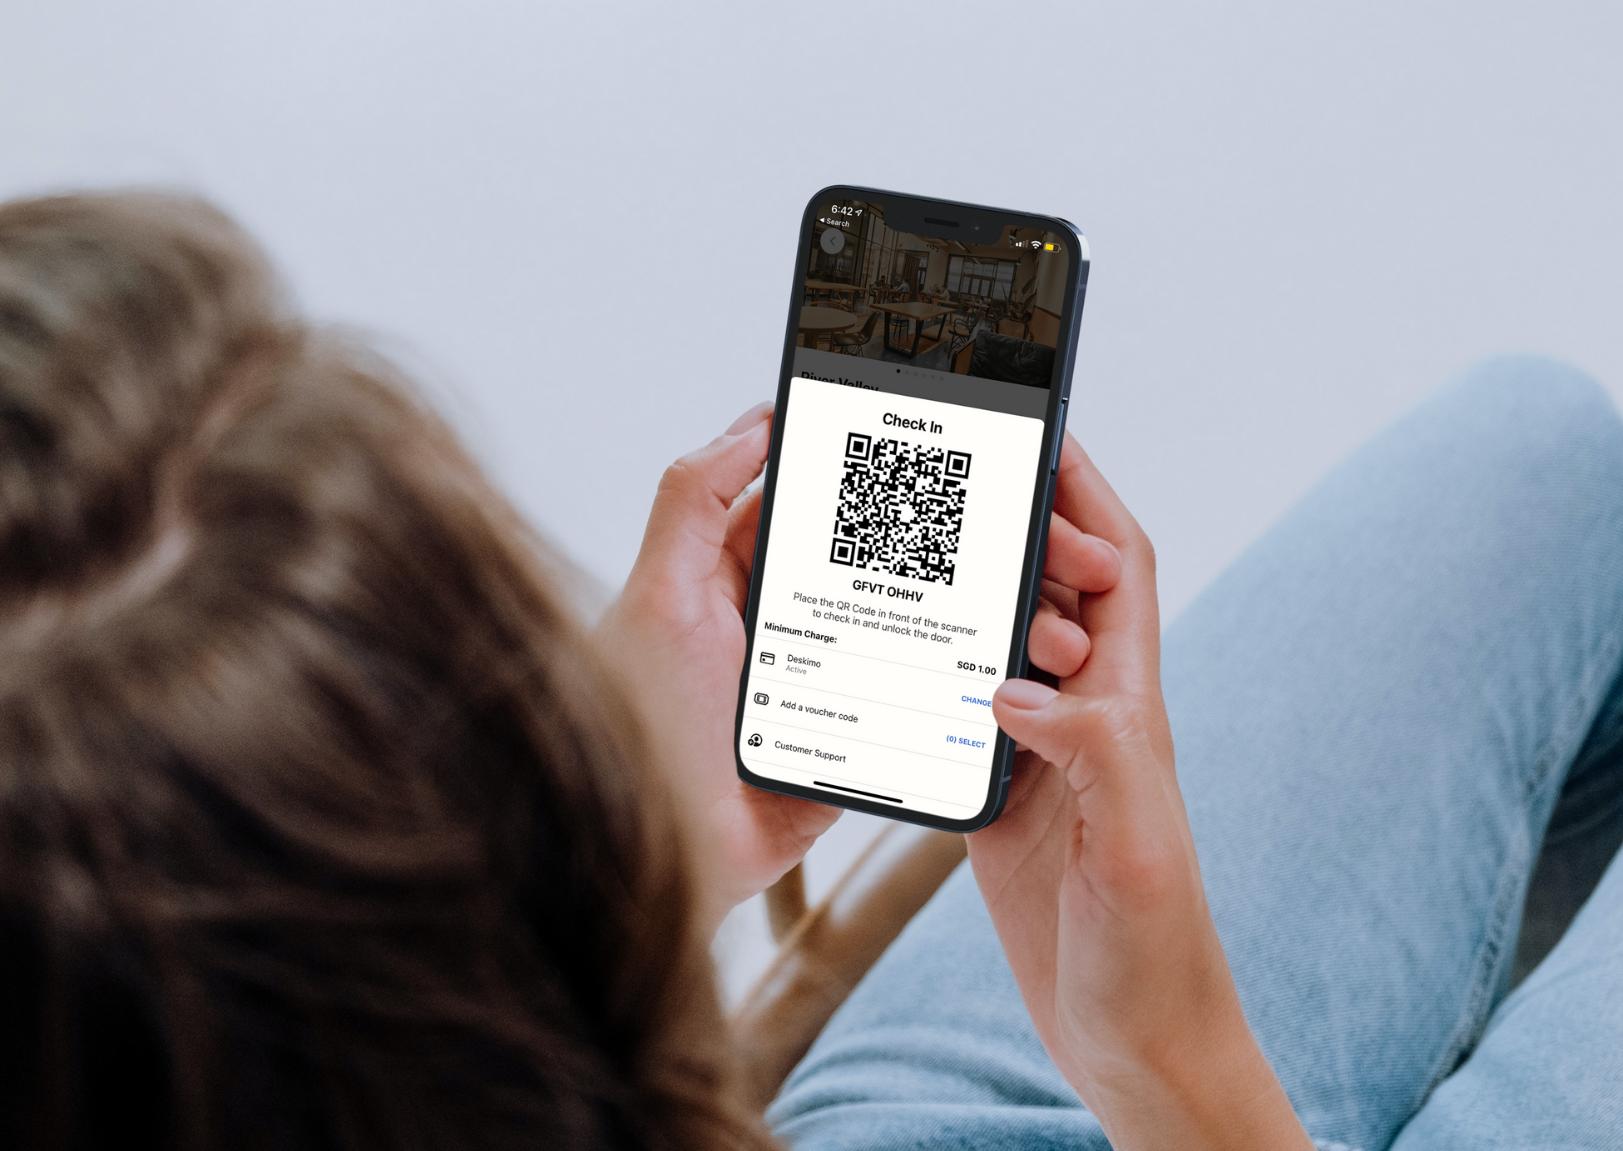 Deskimo app's QR code